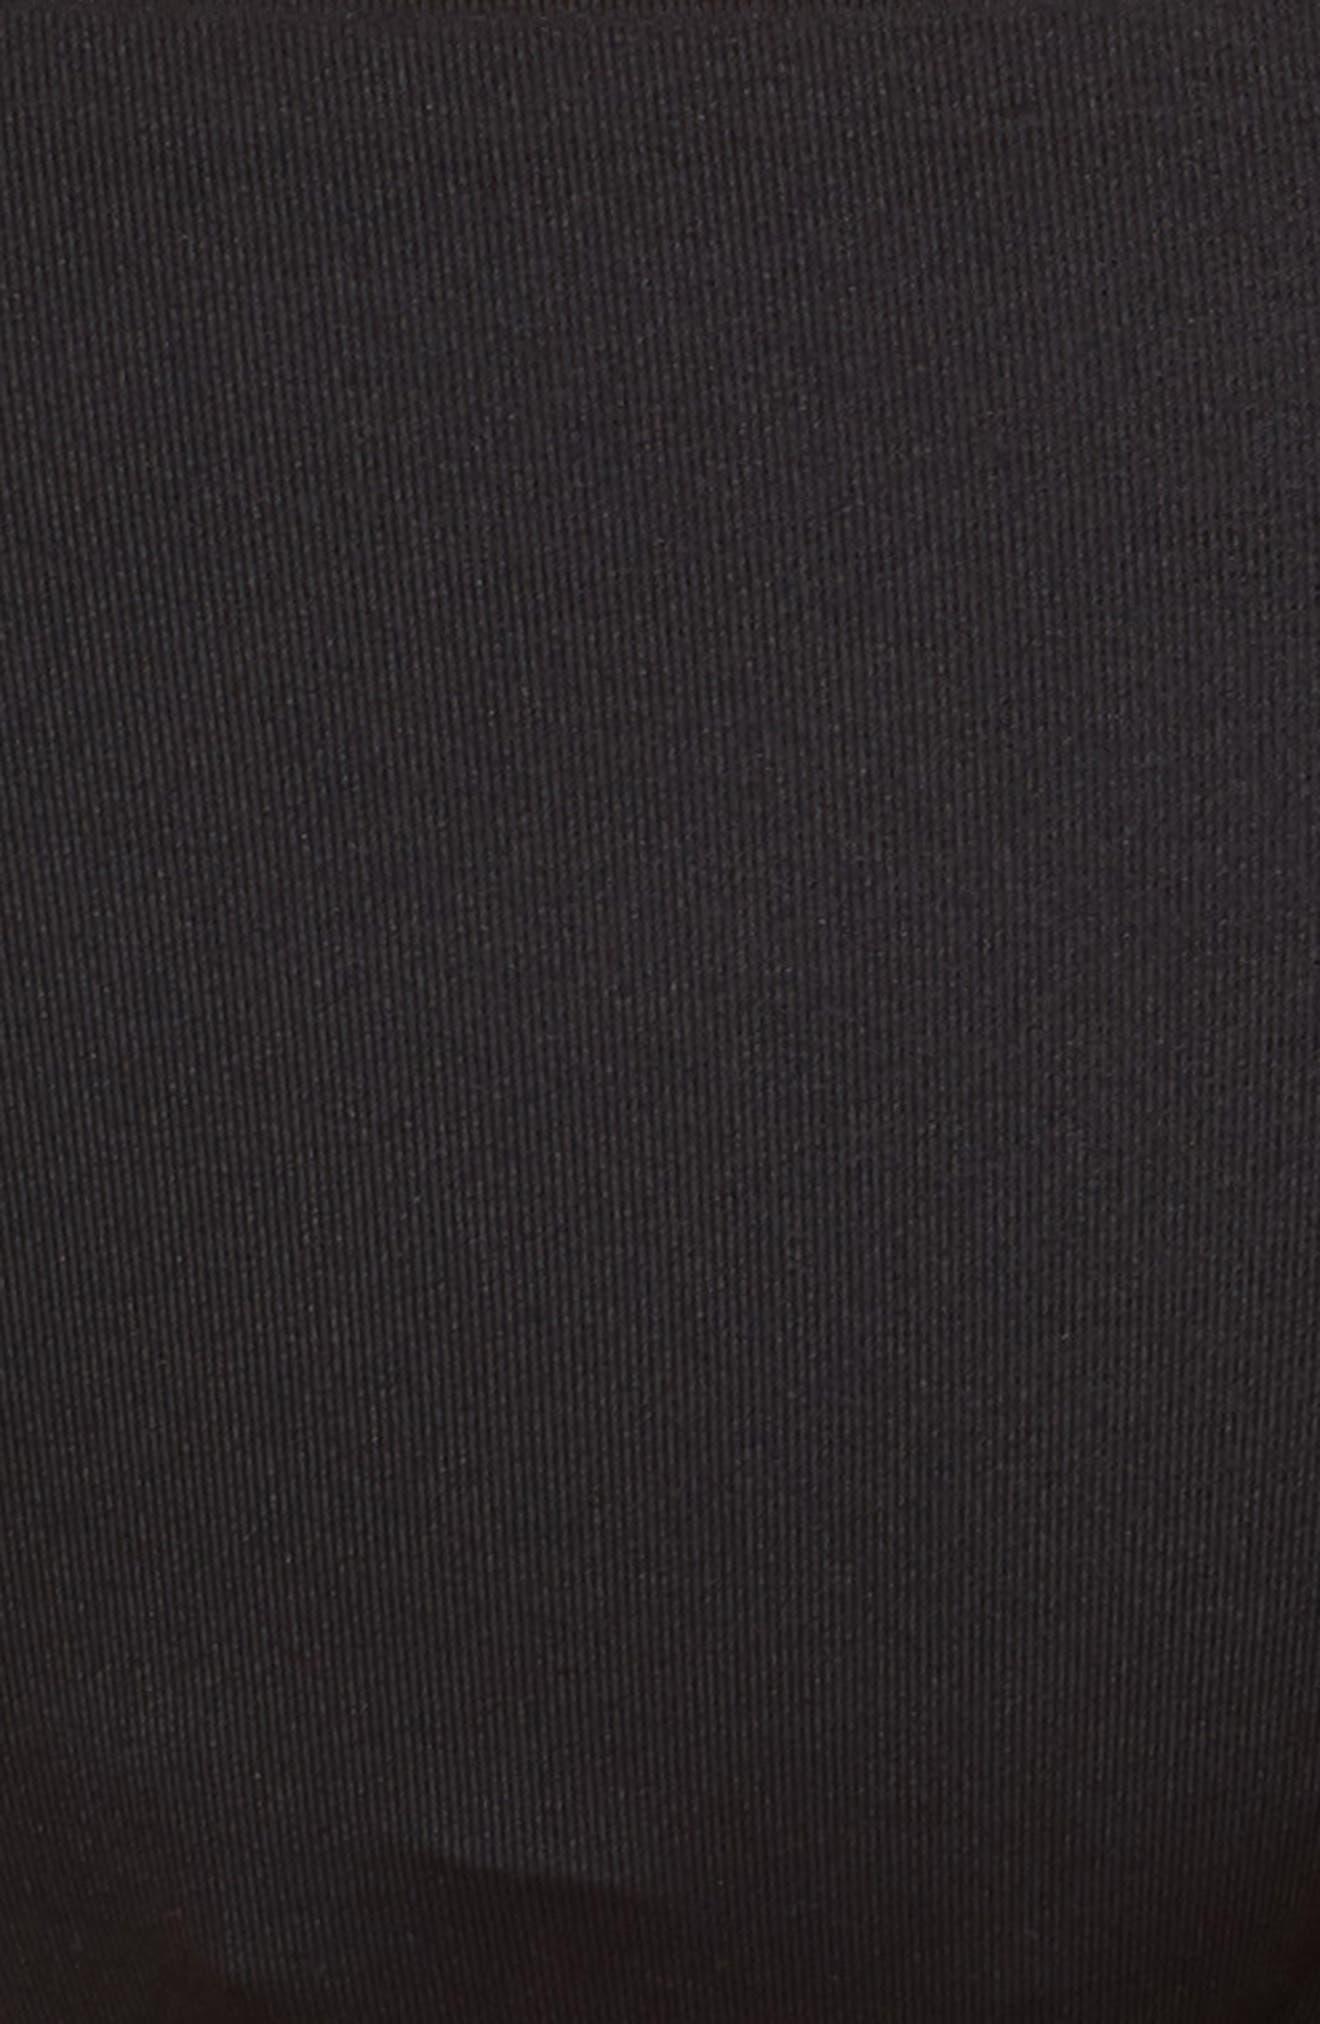 Seaglass Bay Reversible Bikini Bottoms,                             Alternate thumbnail 5, color,                             BLACK